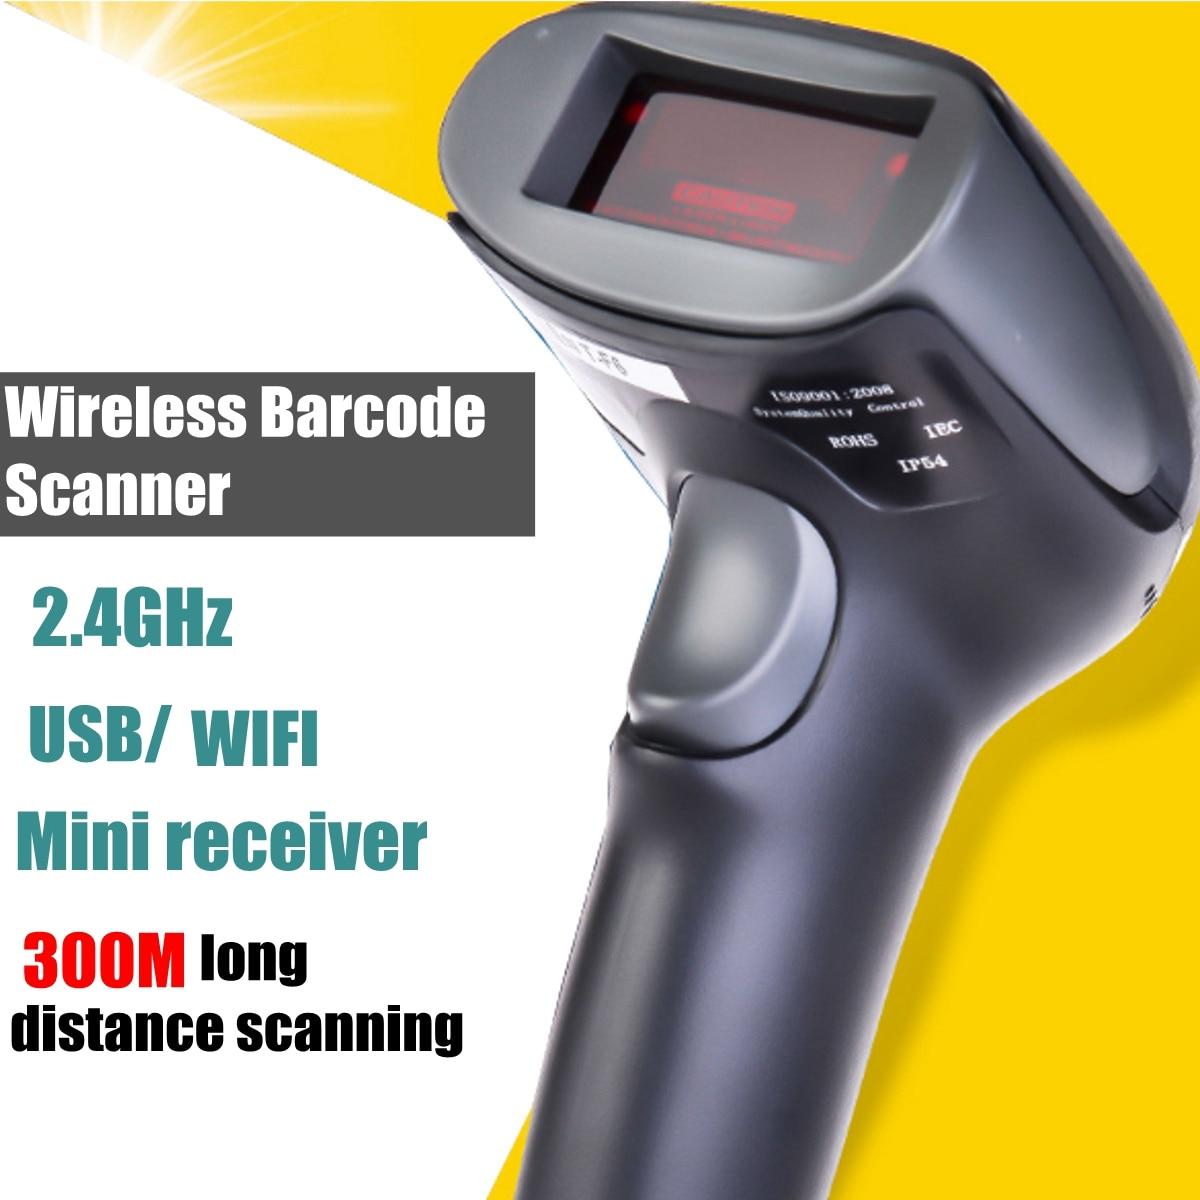 NETUM F6 Bluetooth WIFI Wireless Laser USB Barcode Scanner Scan Label Reader POS Handheld 2.4G new handheld bluetooth wireless usb automatic barcode scanner reader with usb receiver for pos pc laptop em88